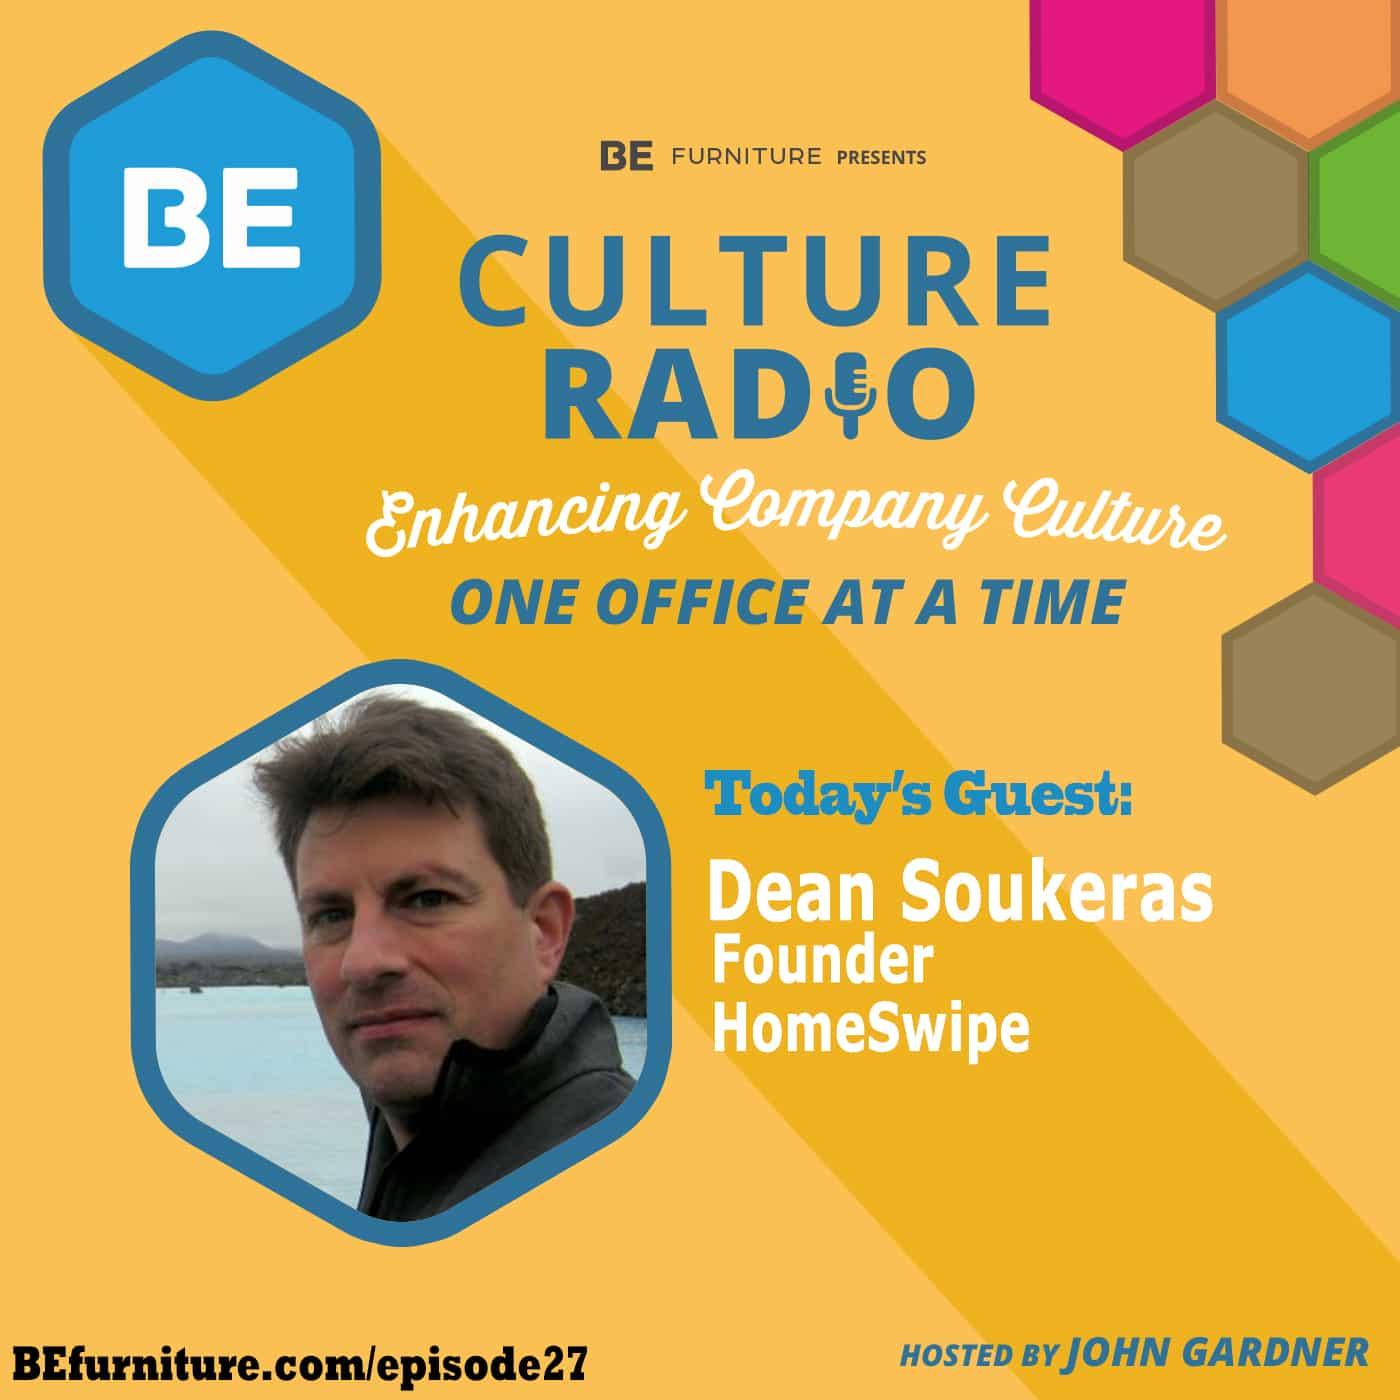 Dean-Soukeras-HomeSwipe-Founder